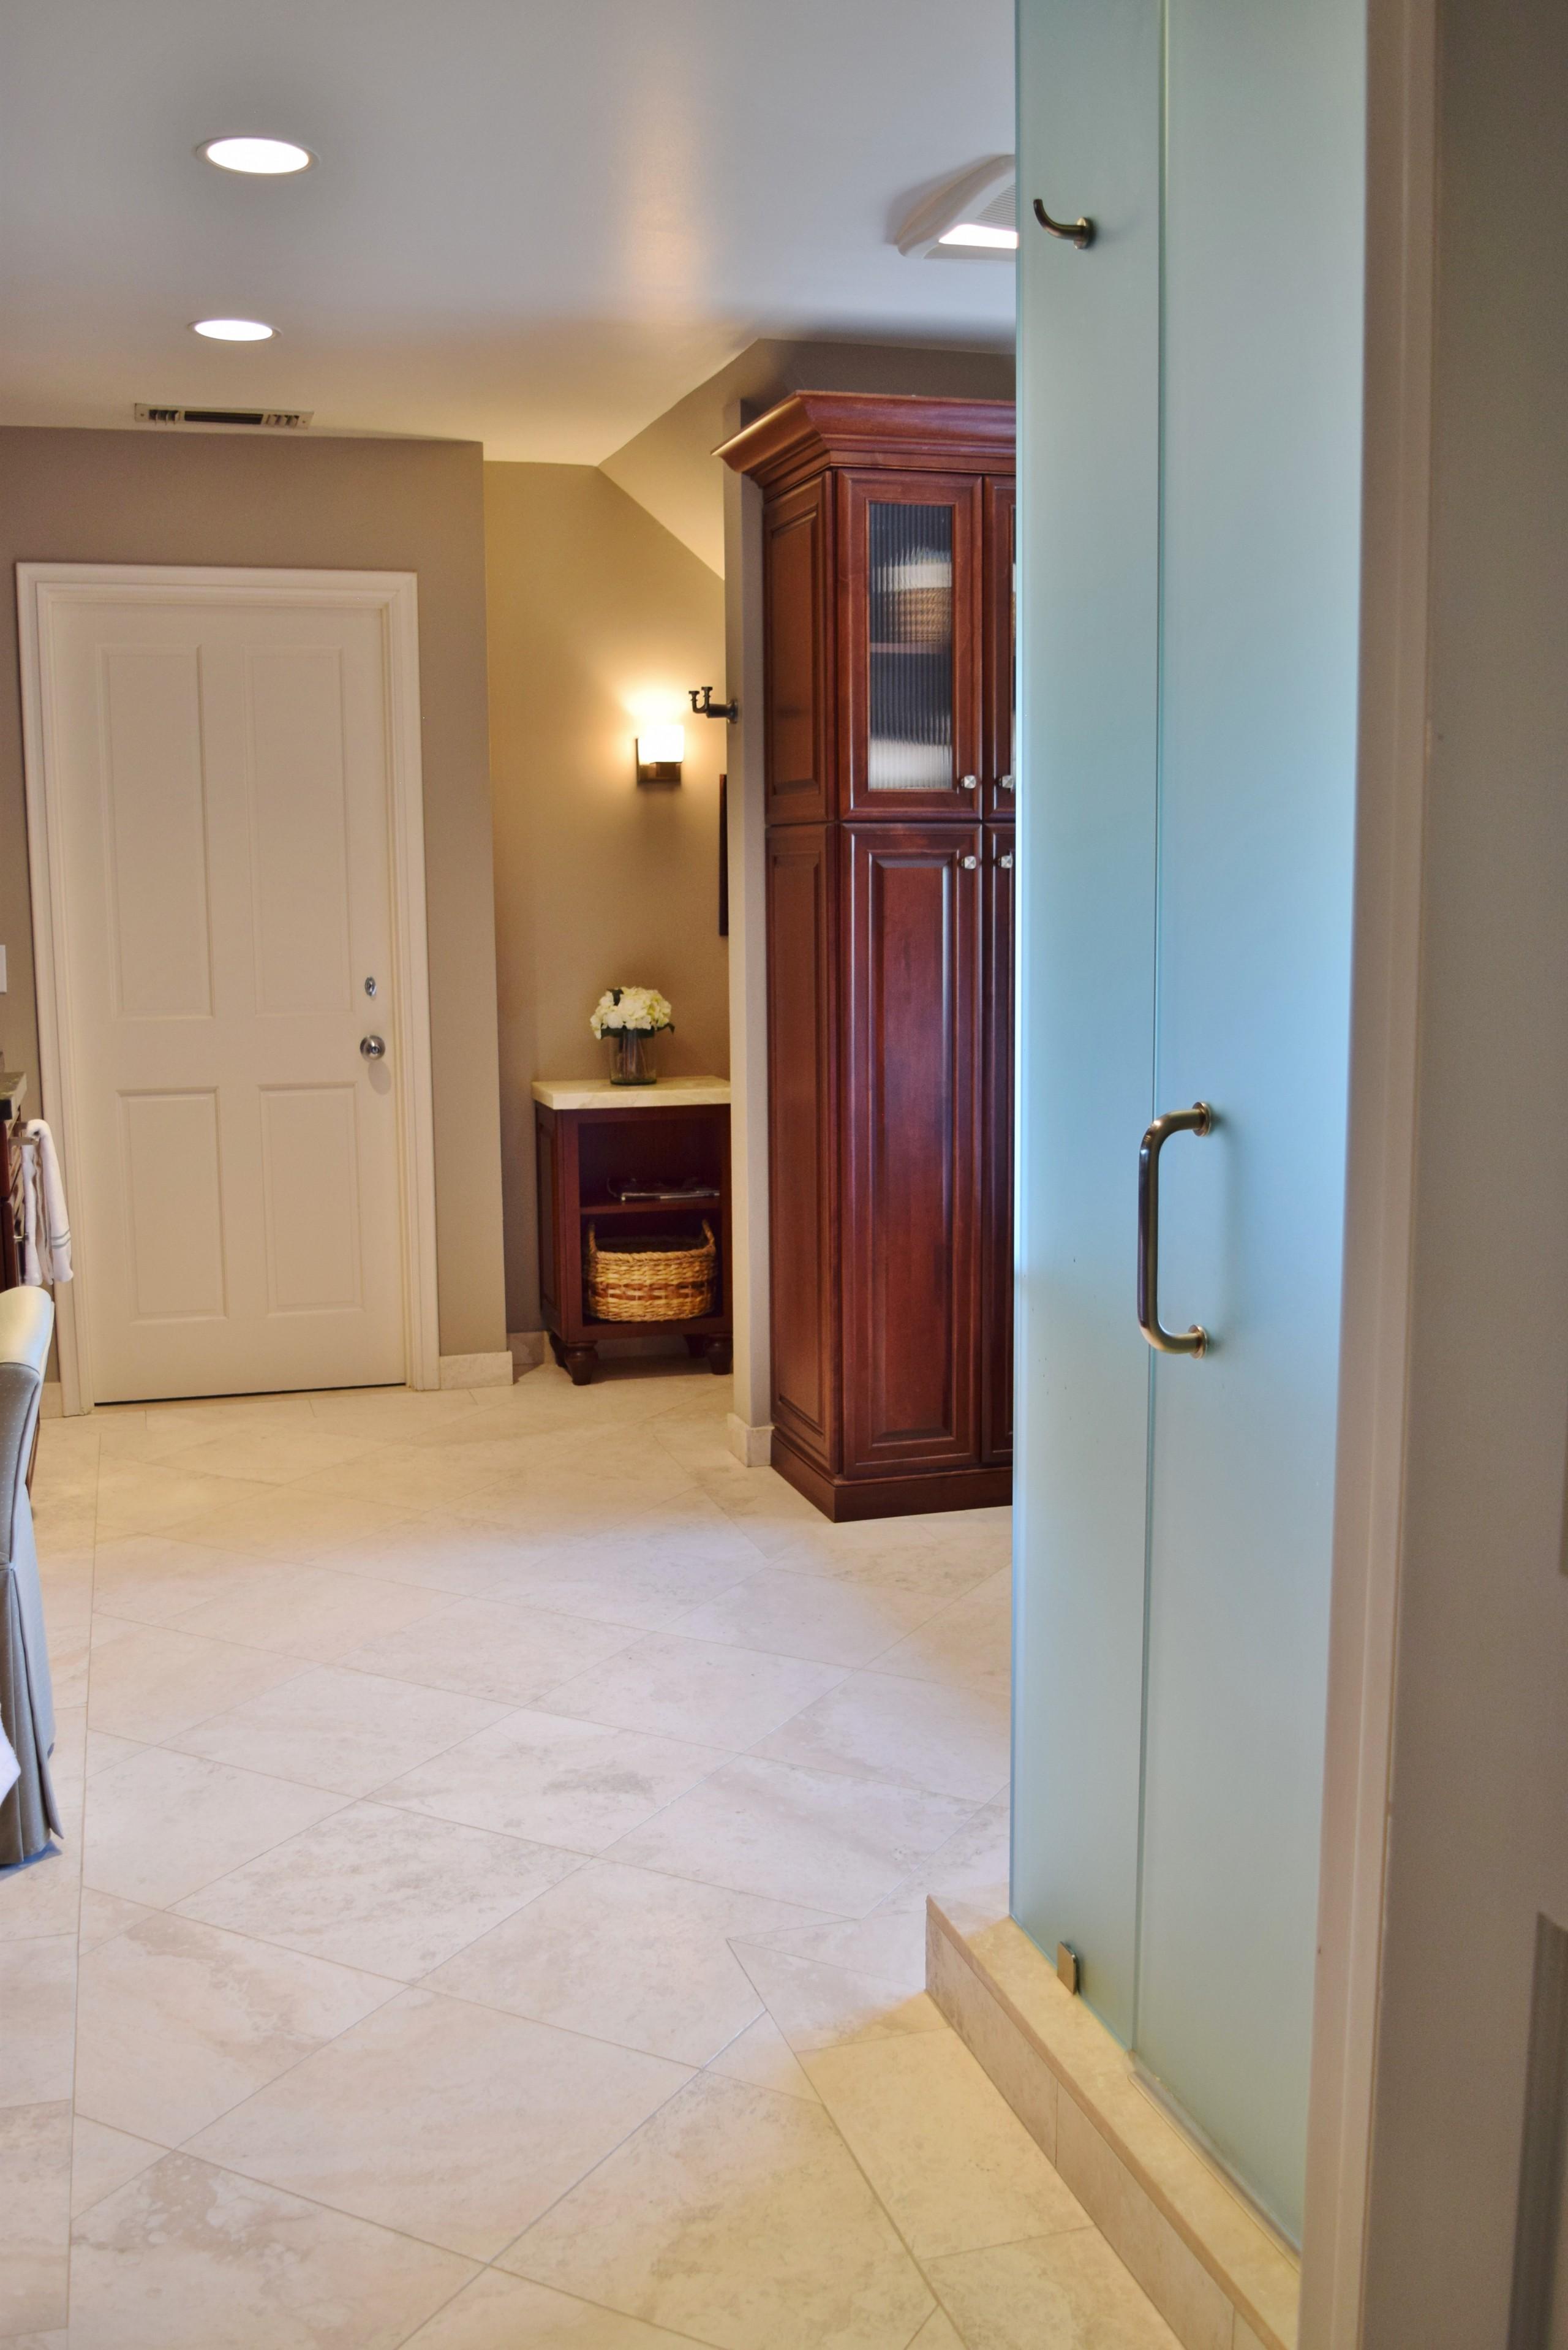 A Spa-Inspired Master Bath Remodel for a Client in La Canada, Ca.